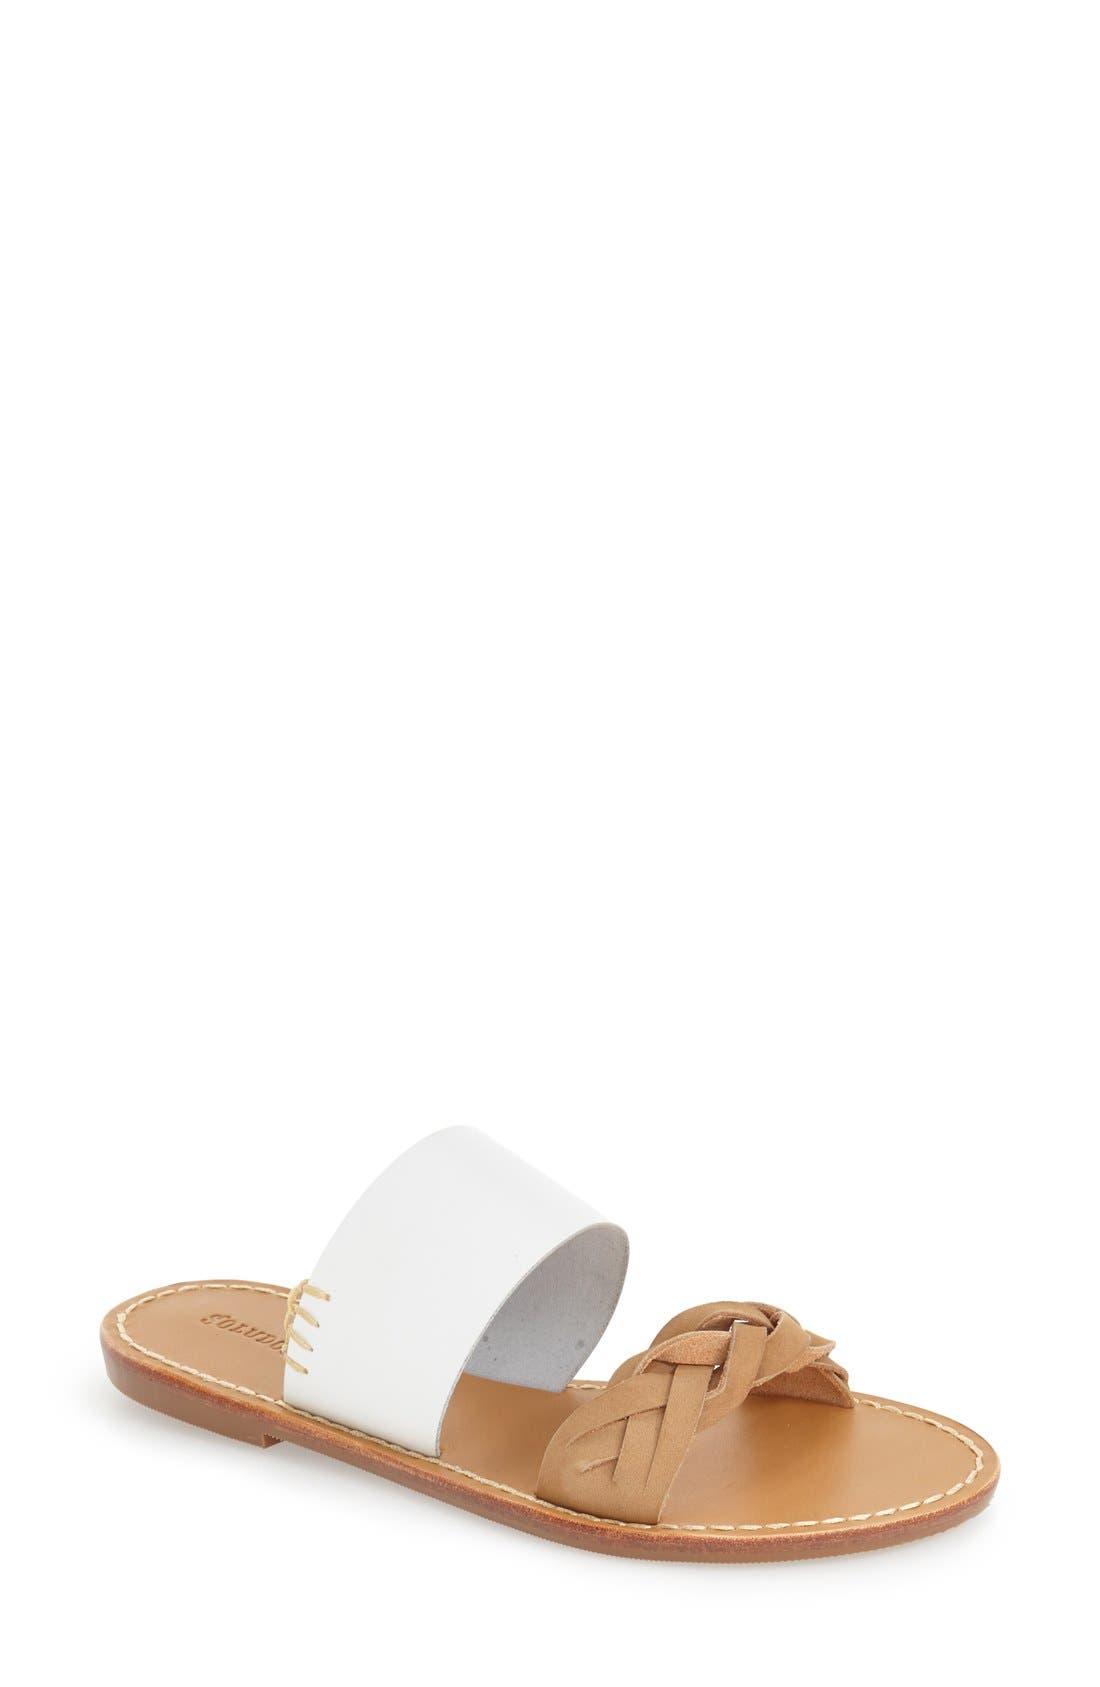 Slide Sandal by Soludos